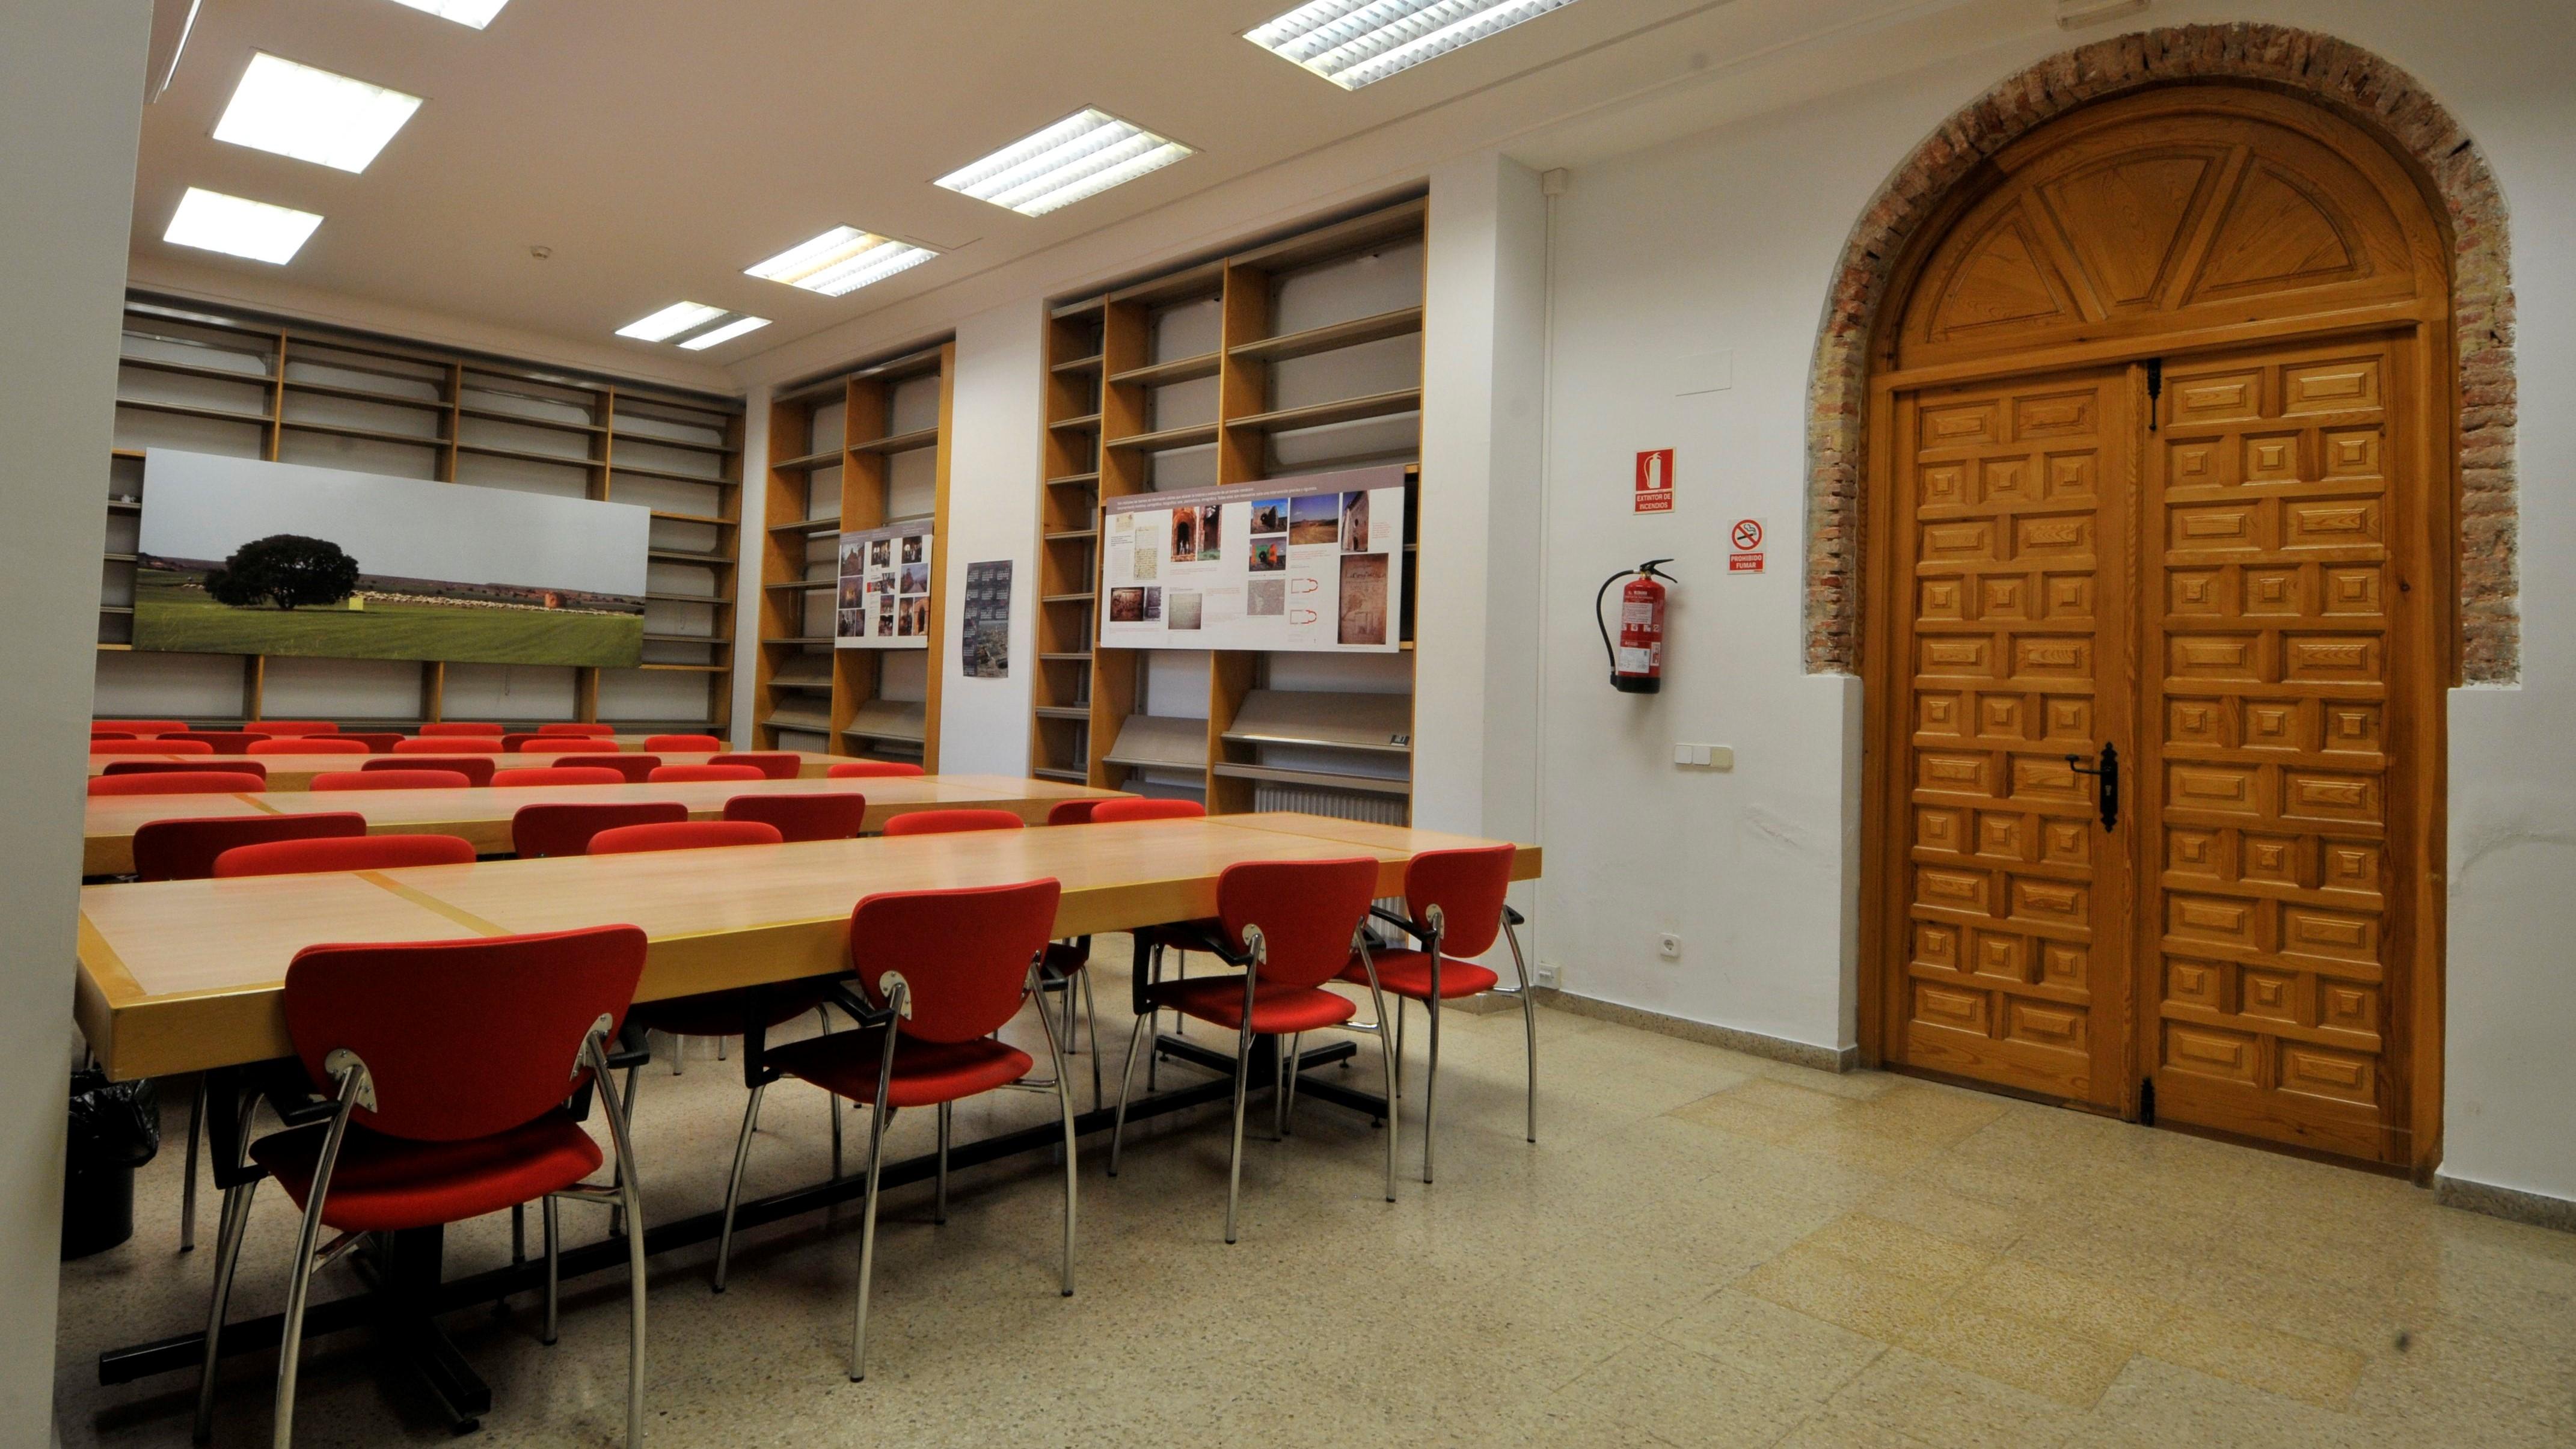 https://funge.uva.es/wp-content/uploads/2020/12/Sala-de-estudio-Residencia-Duques-de-Soria-Universidad-de-Valladolid1.jpg